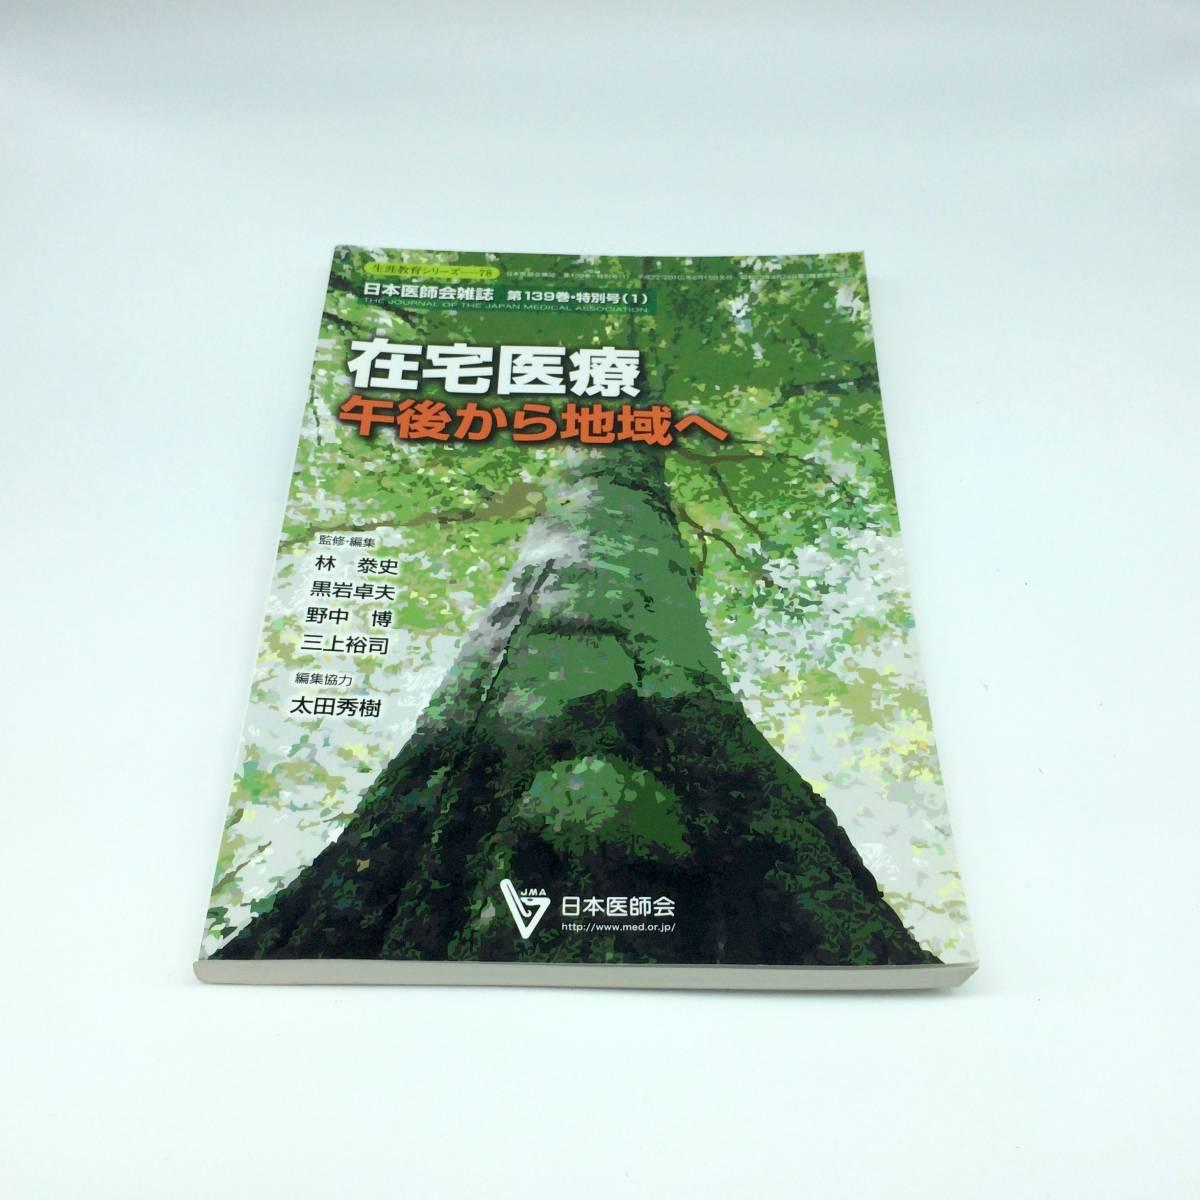 在宅医療 午後から地域へ 生涯教育シリーズ 78 日本医師会雑誌 第139巻 特別号_画像2